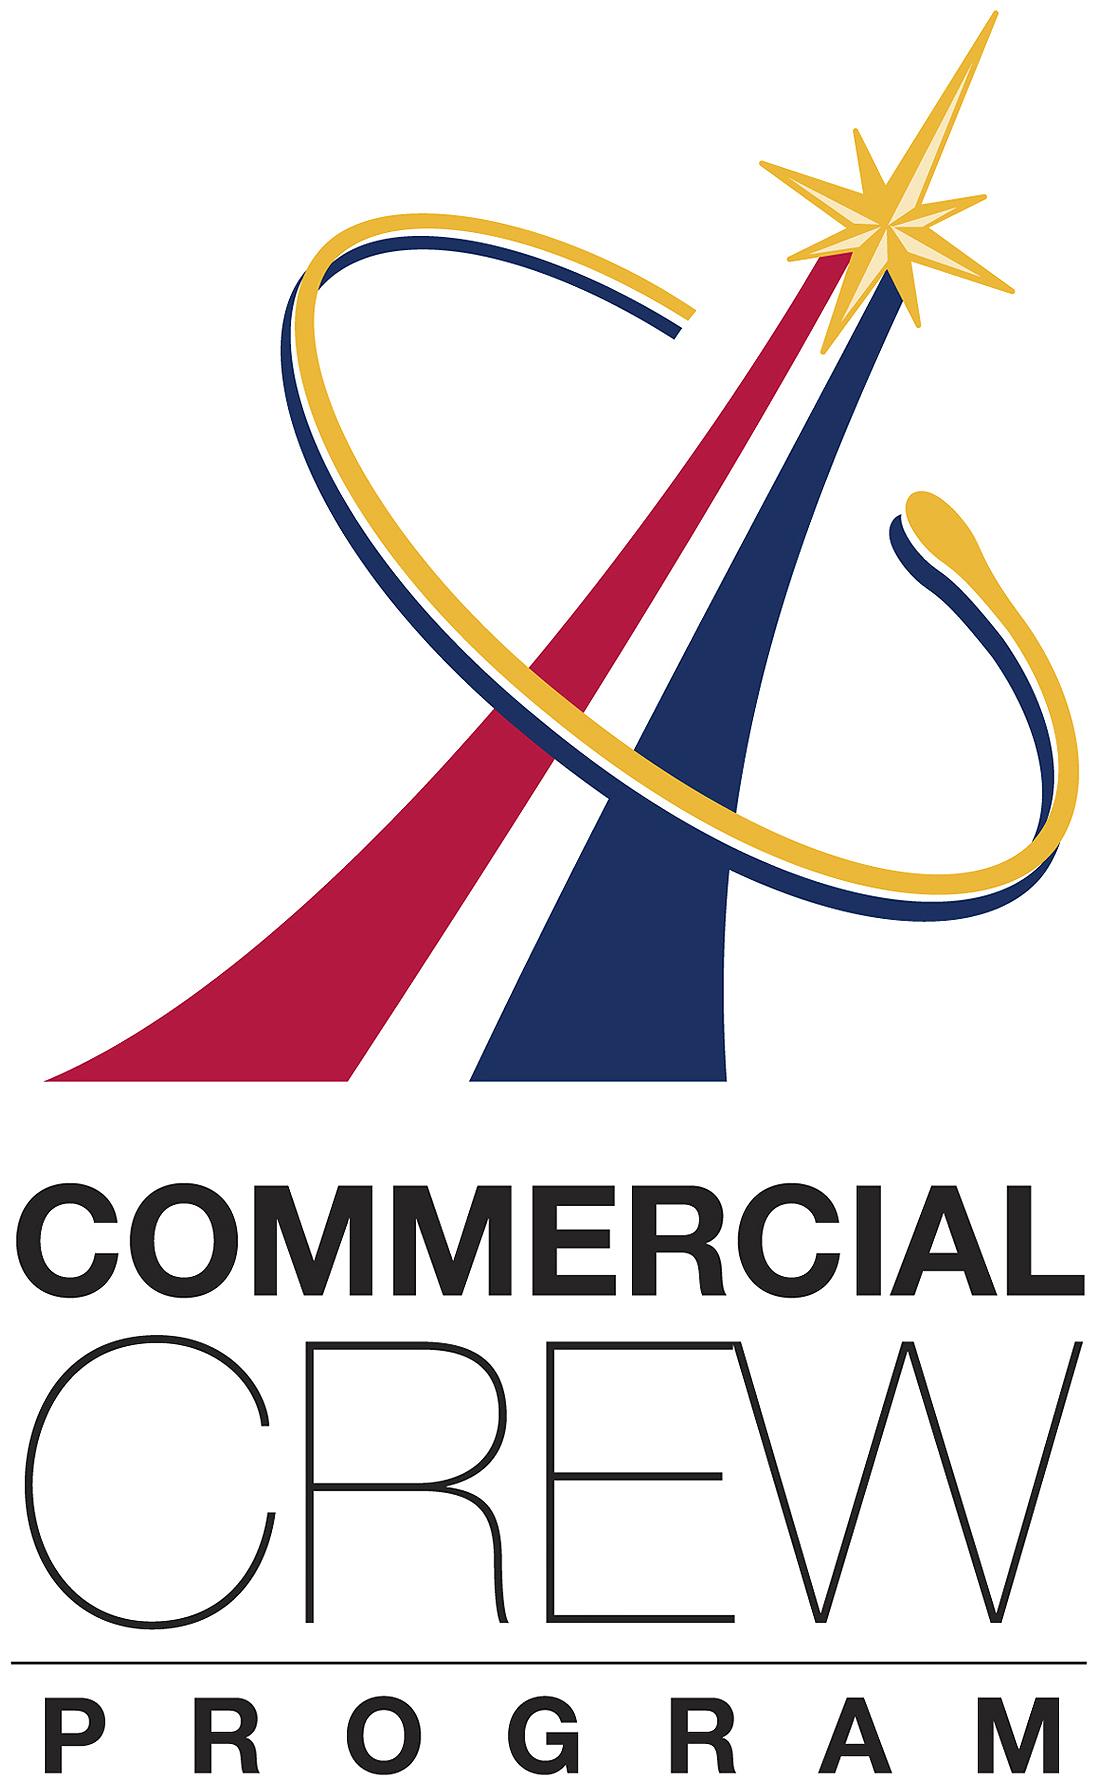 Commercial, Crew, Program, NASA